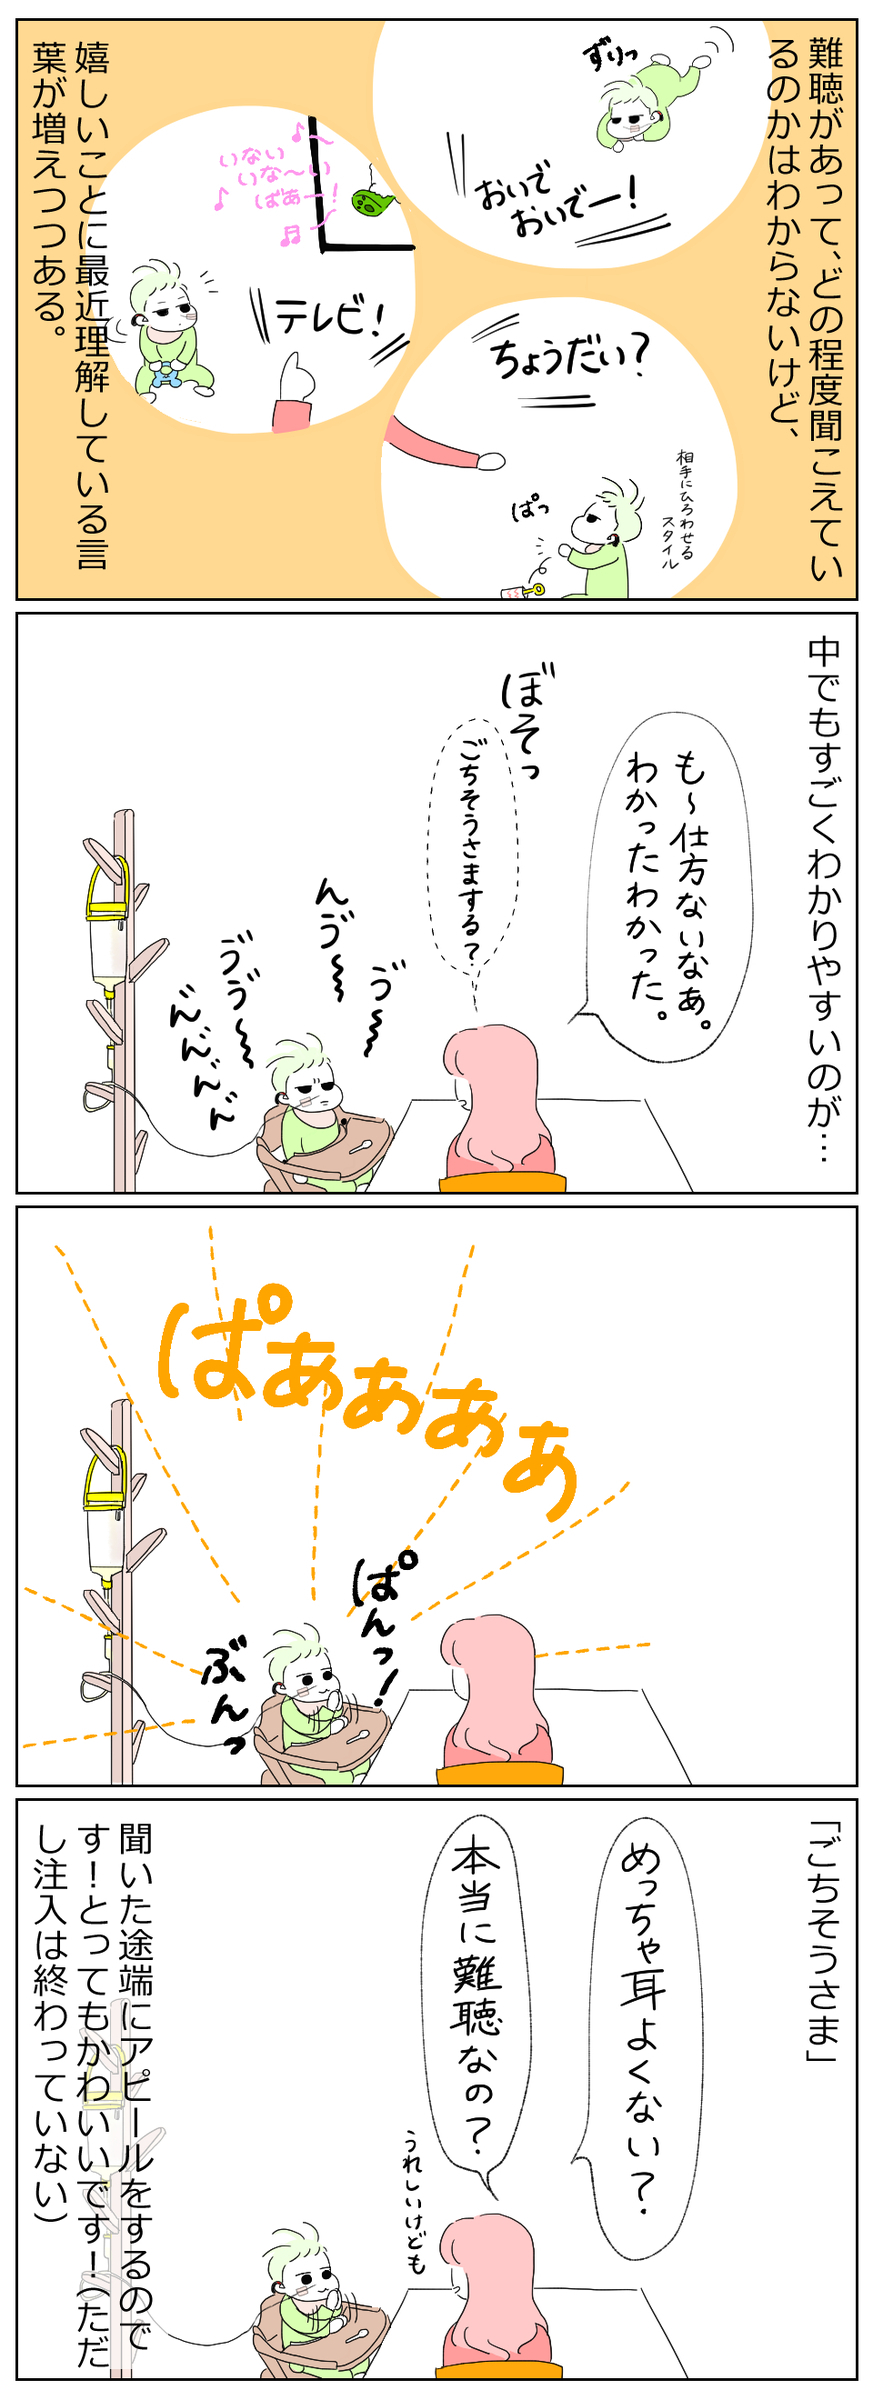 f:id:kayarimo:20190316121854j:plain